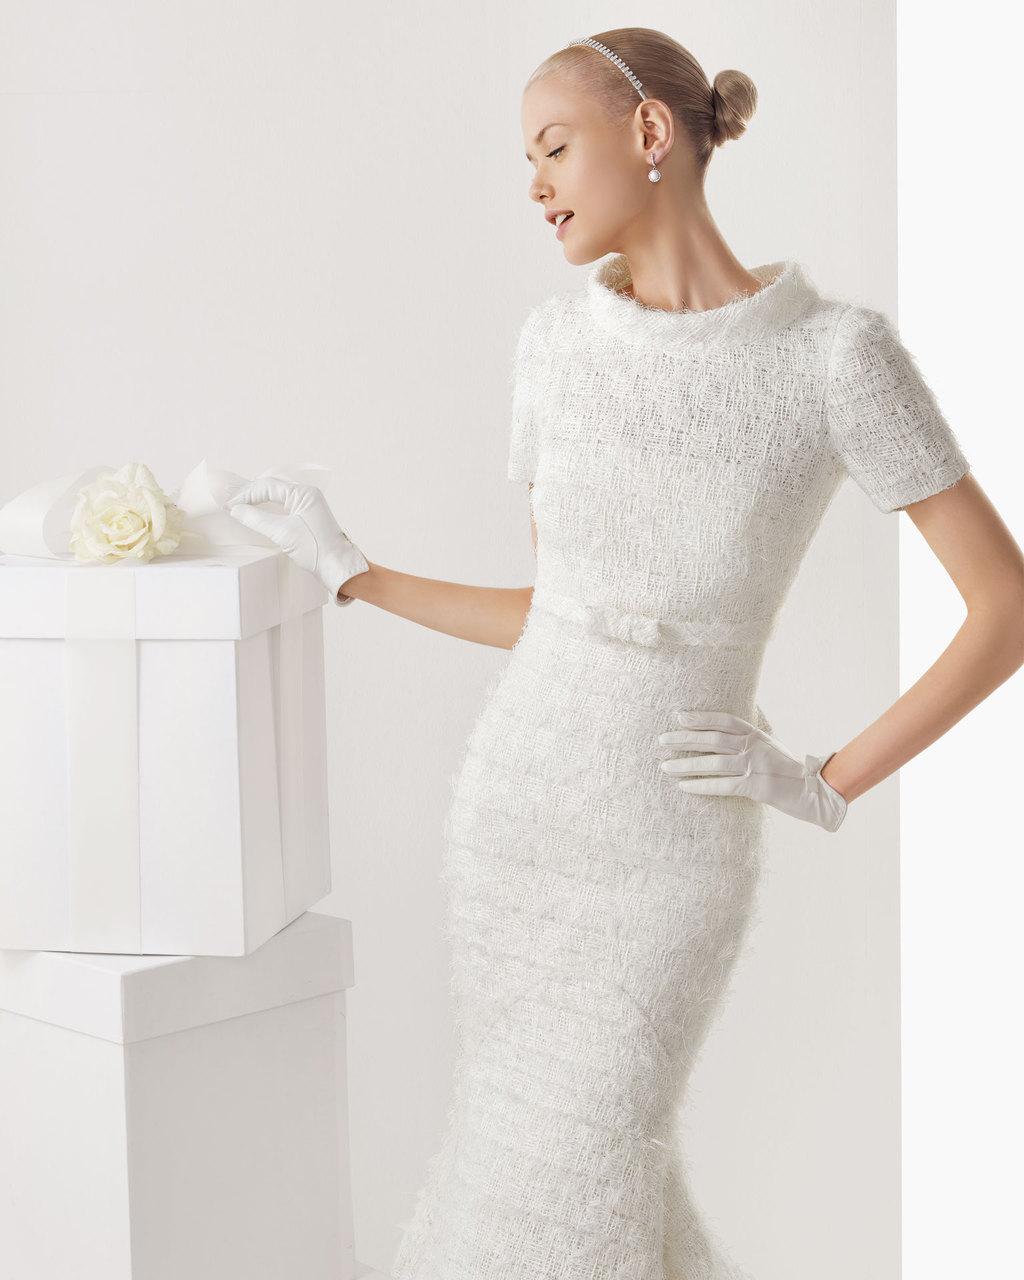 Transforming-wedding-dresses-2013-bridal-gown-by-rosa-clara-11.full